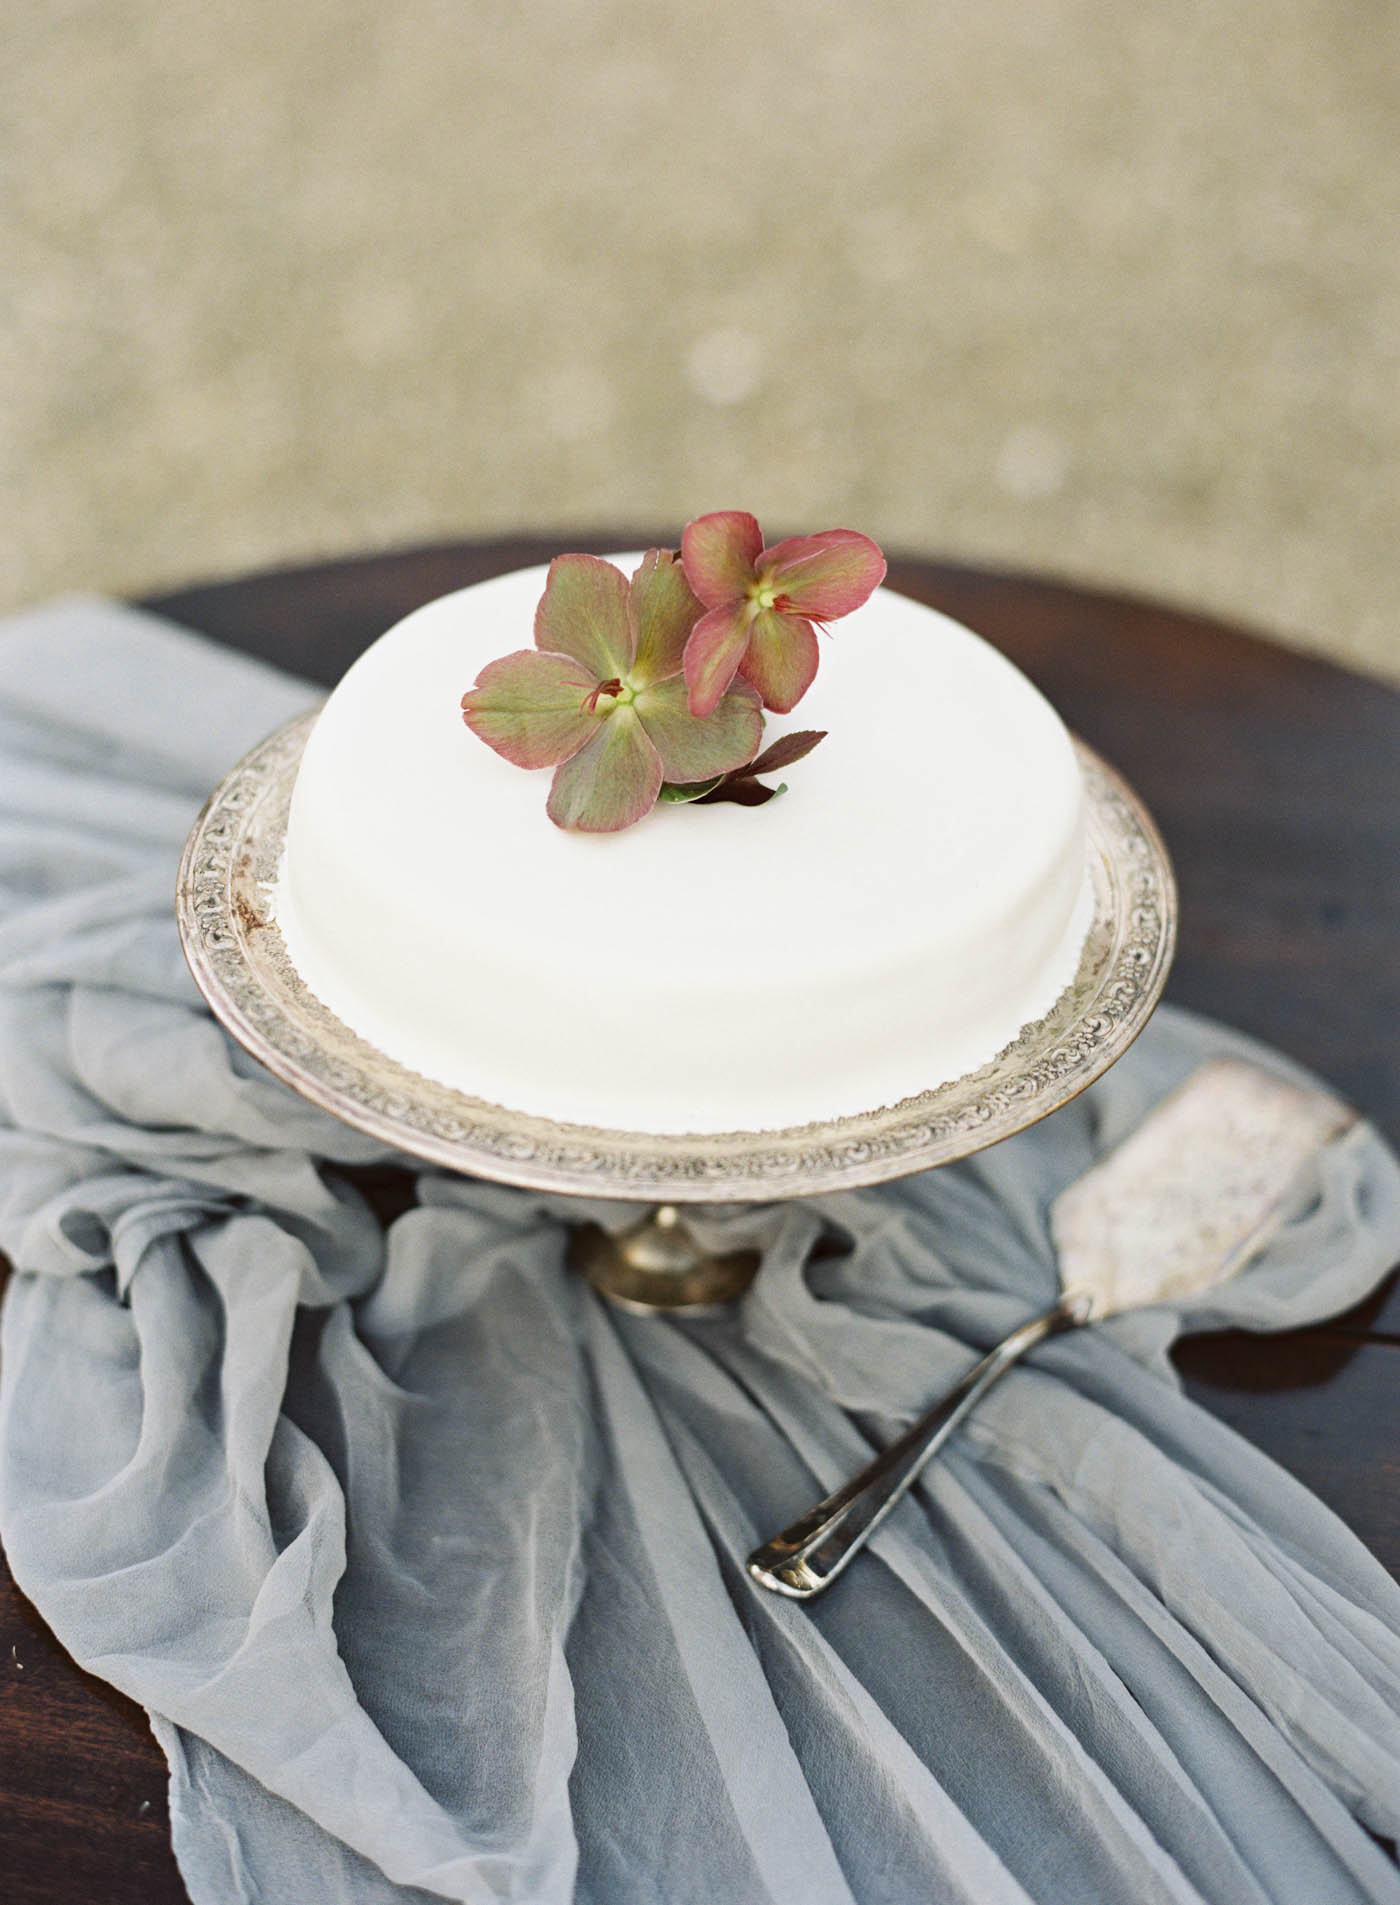 Villa_Cetinale_Wedding-49-Jen_Huang-ElanJacob-302-Jen_Huang-007313-R1-007.jpg